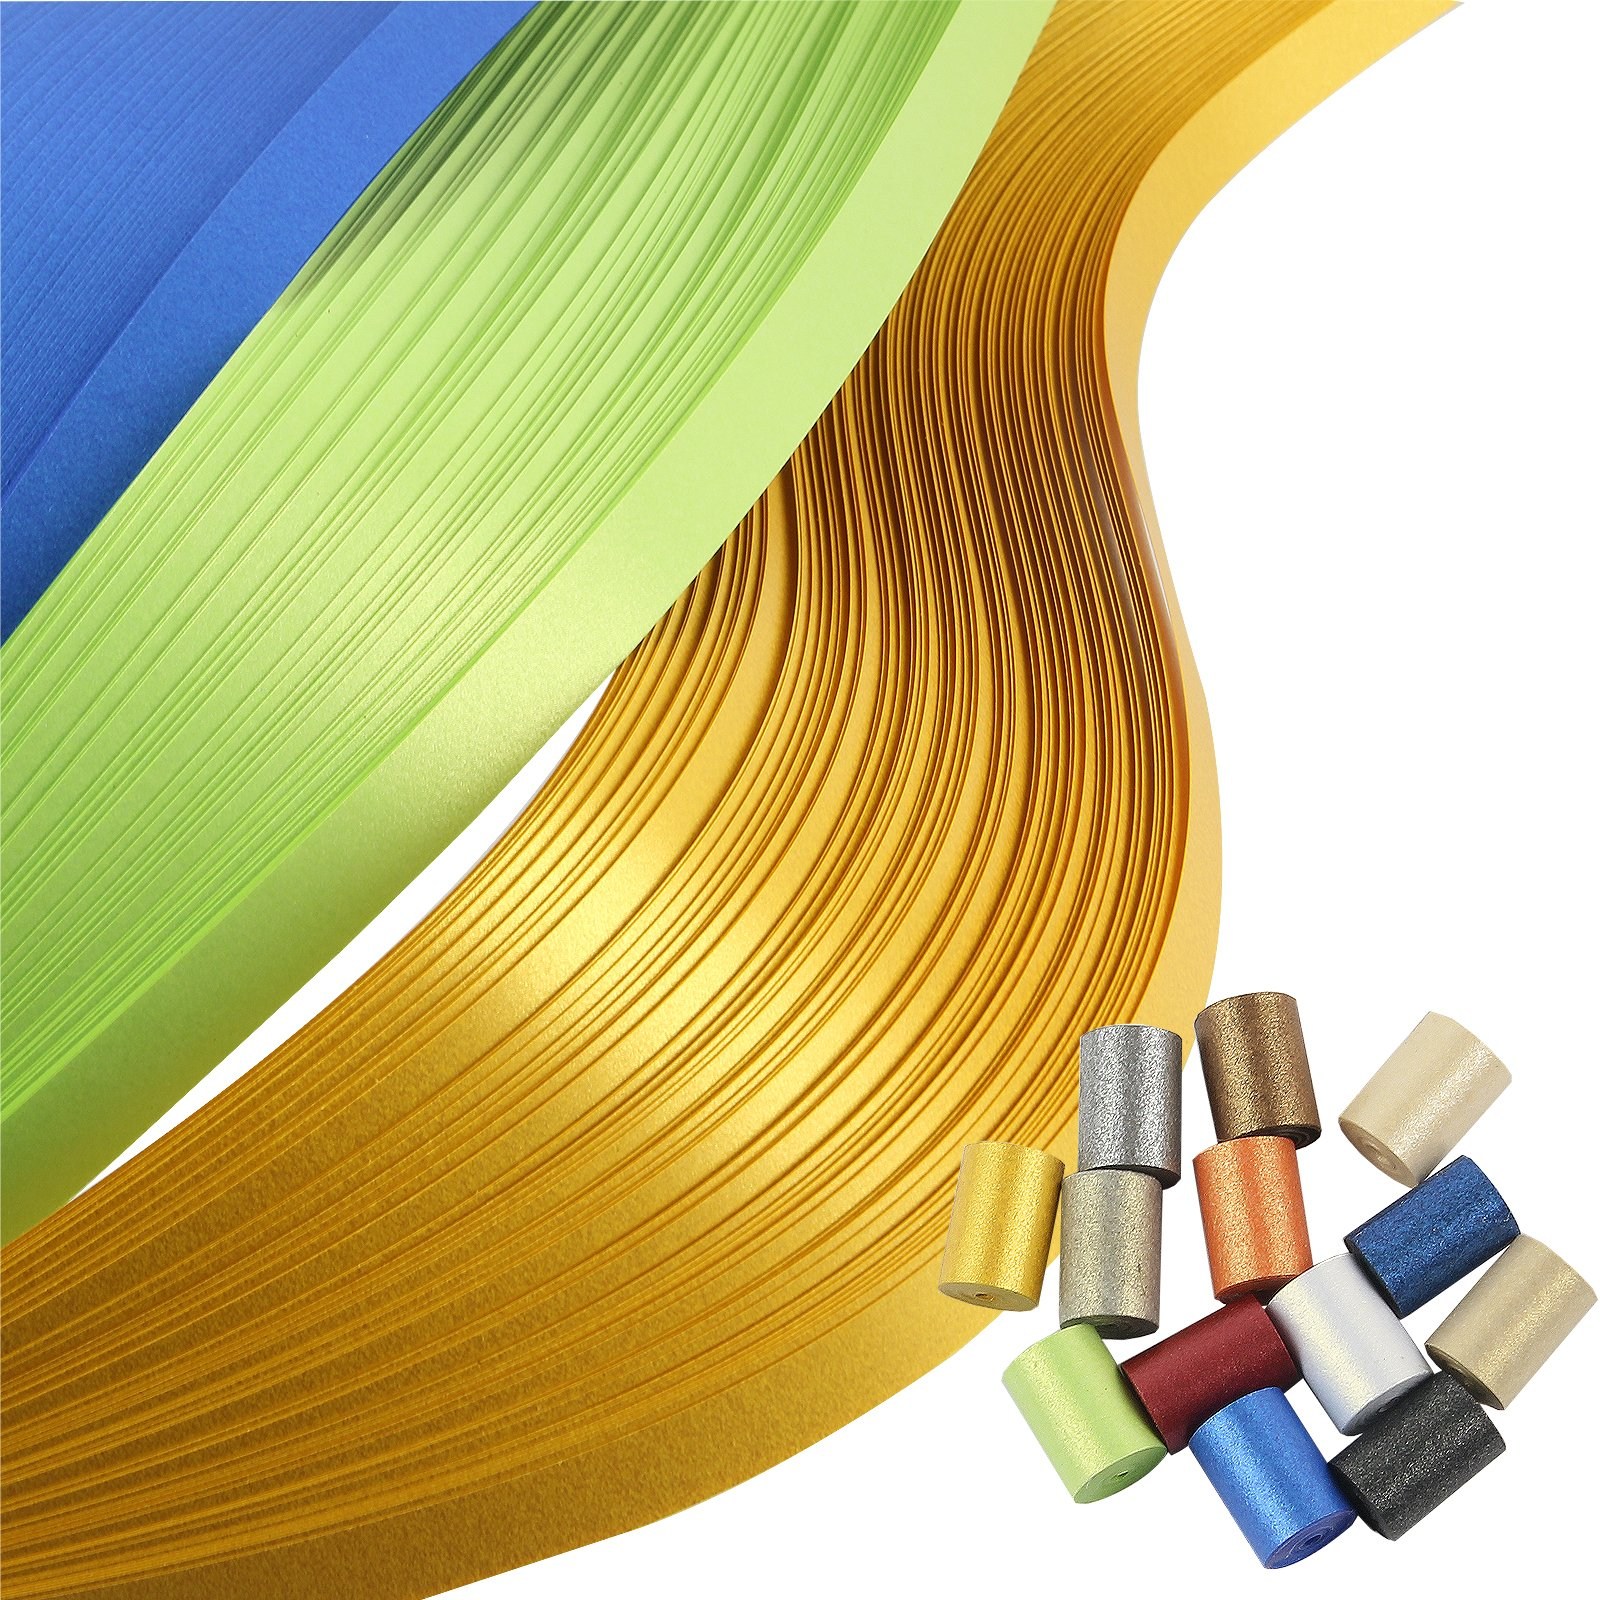 IMISNO Metallic Quilling Paper Set 5mm Width 780 Strips (13 Colors 54cm Length)